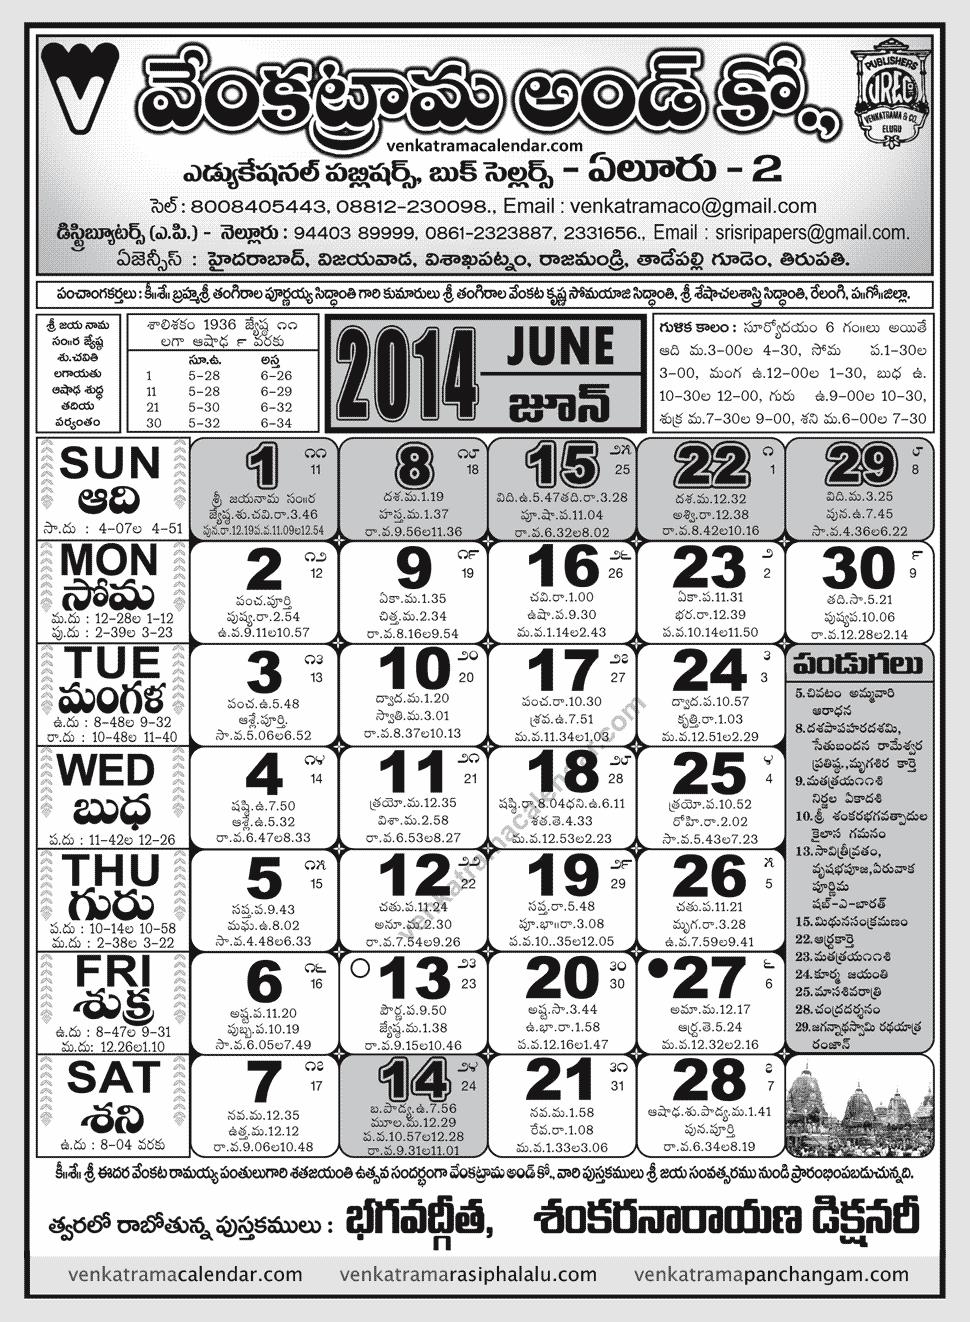 Venkatrama Calendar June : Venkatrama co calendar june telugu